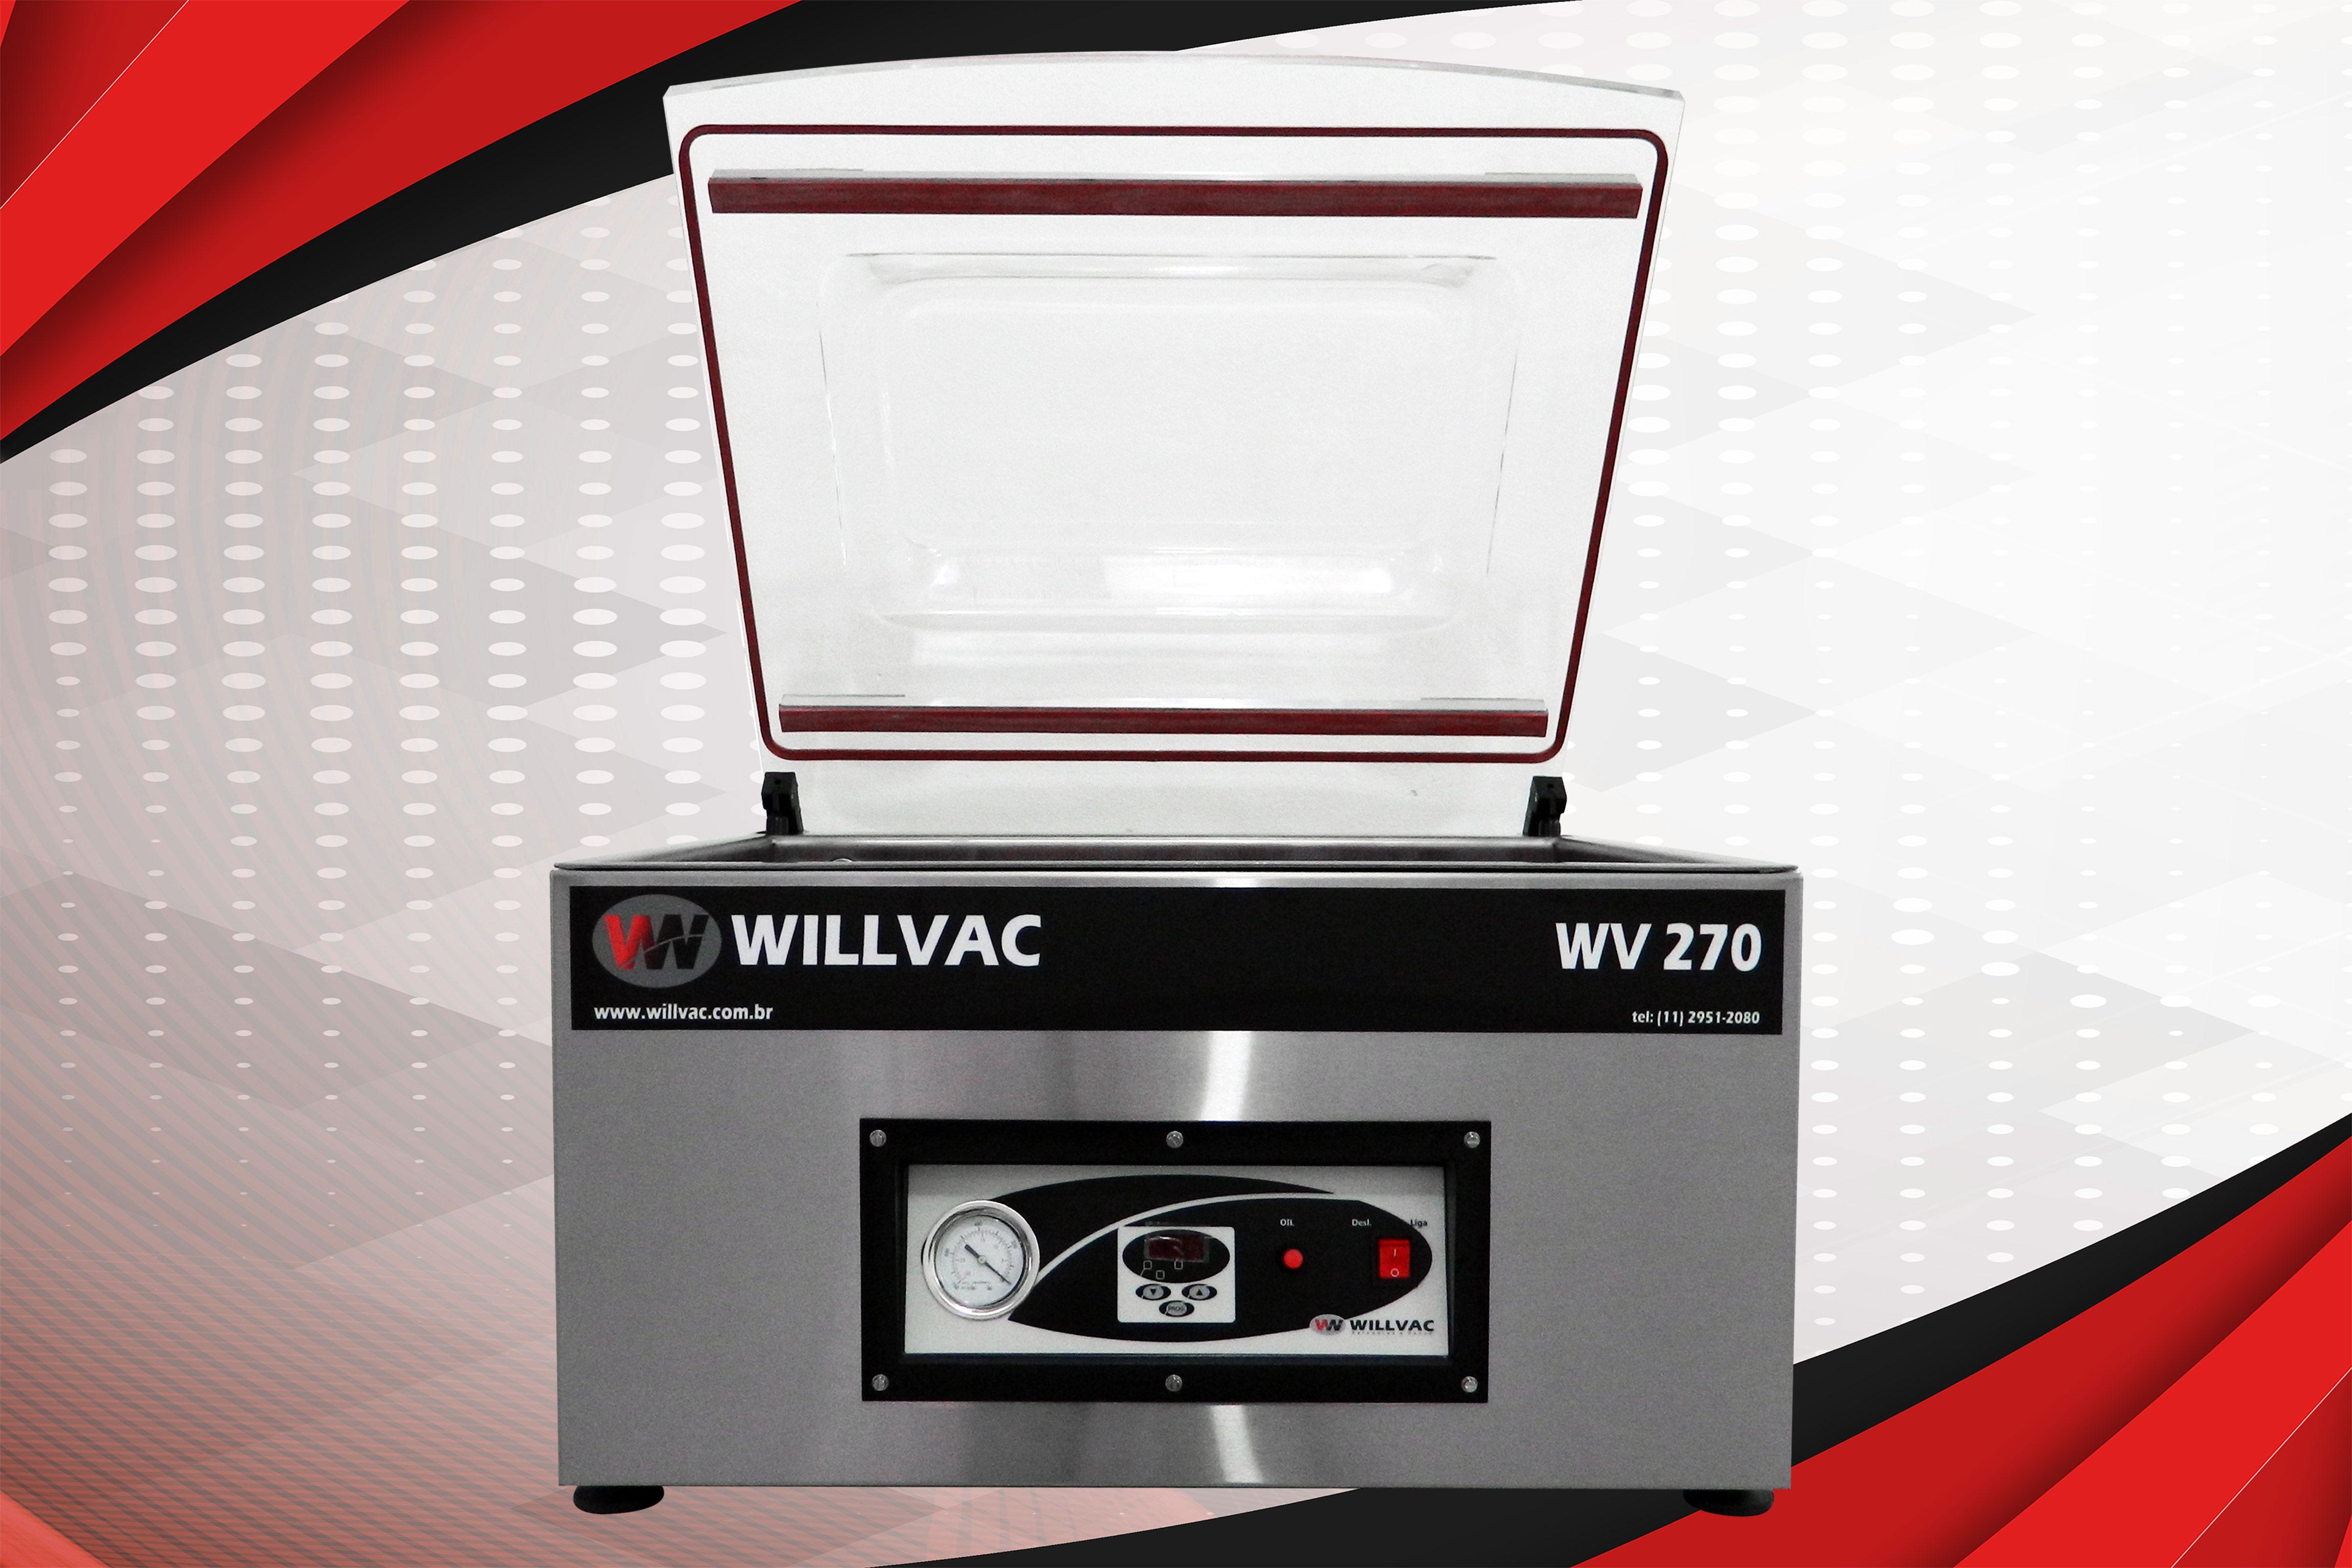 WV 270